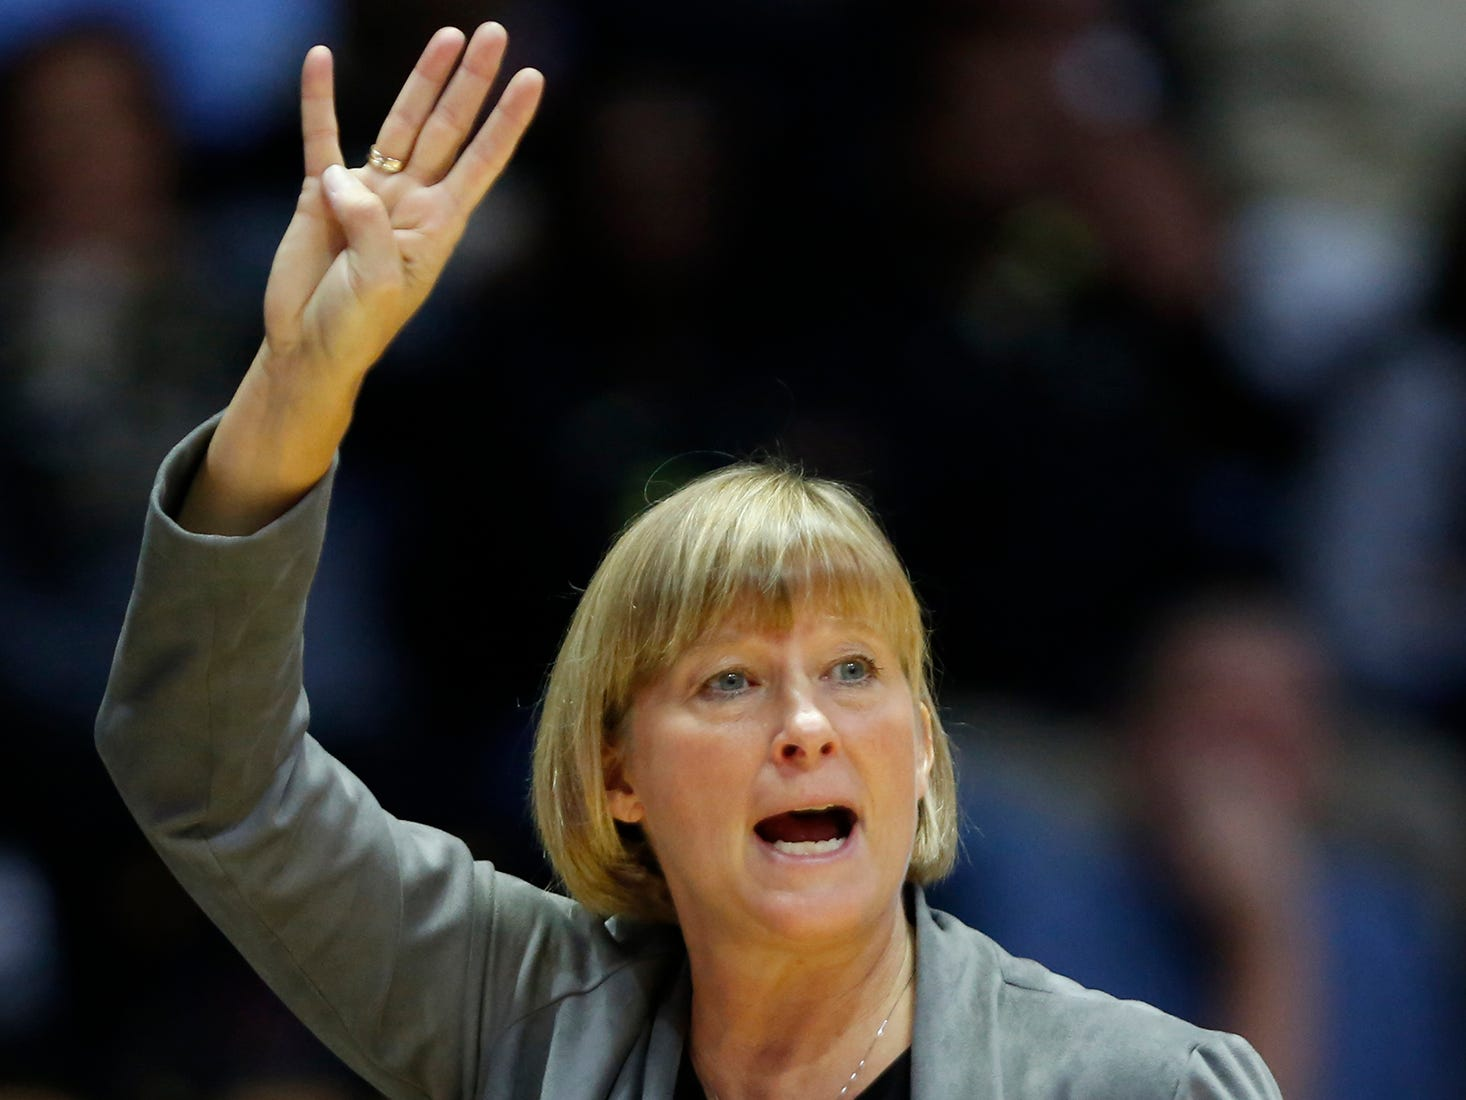 Purdue head coach Sharon Versyp shouts instructions as the Boilermakers battle Ashland Sunday, November 4, 2018, at Mackey Arena. Purdue defeated Ashland 85-69.